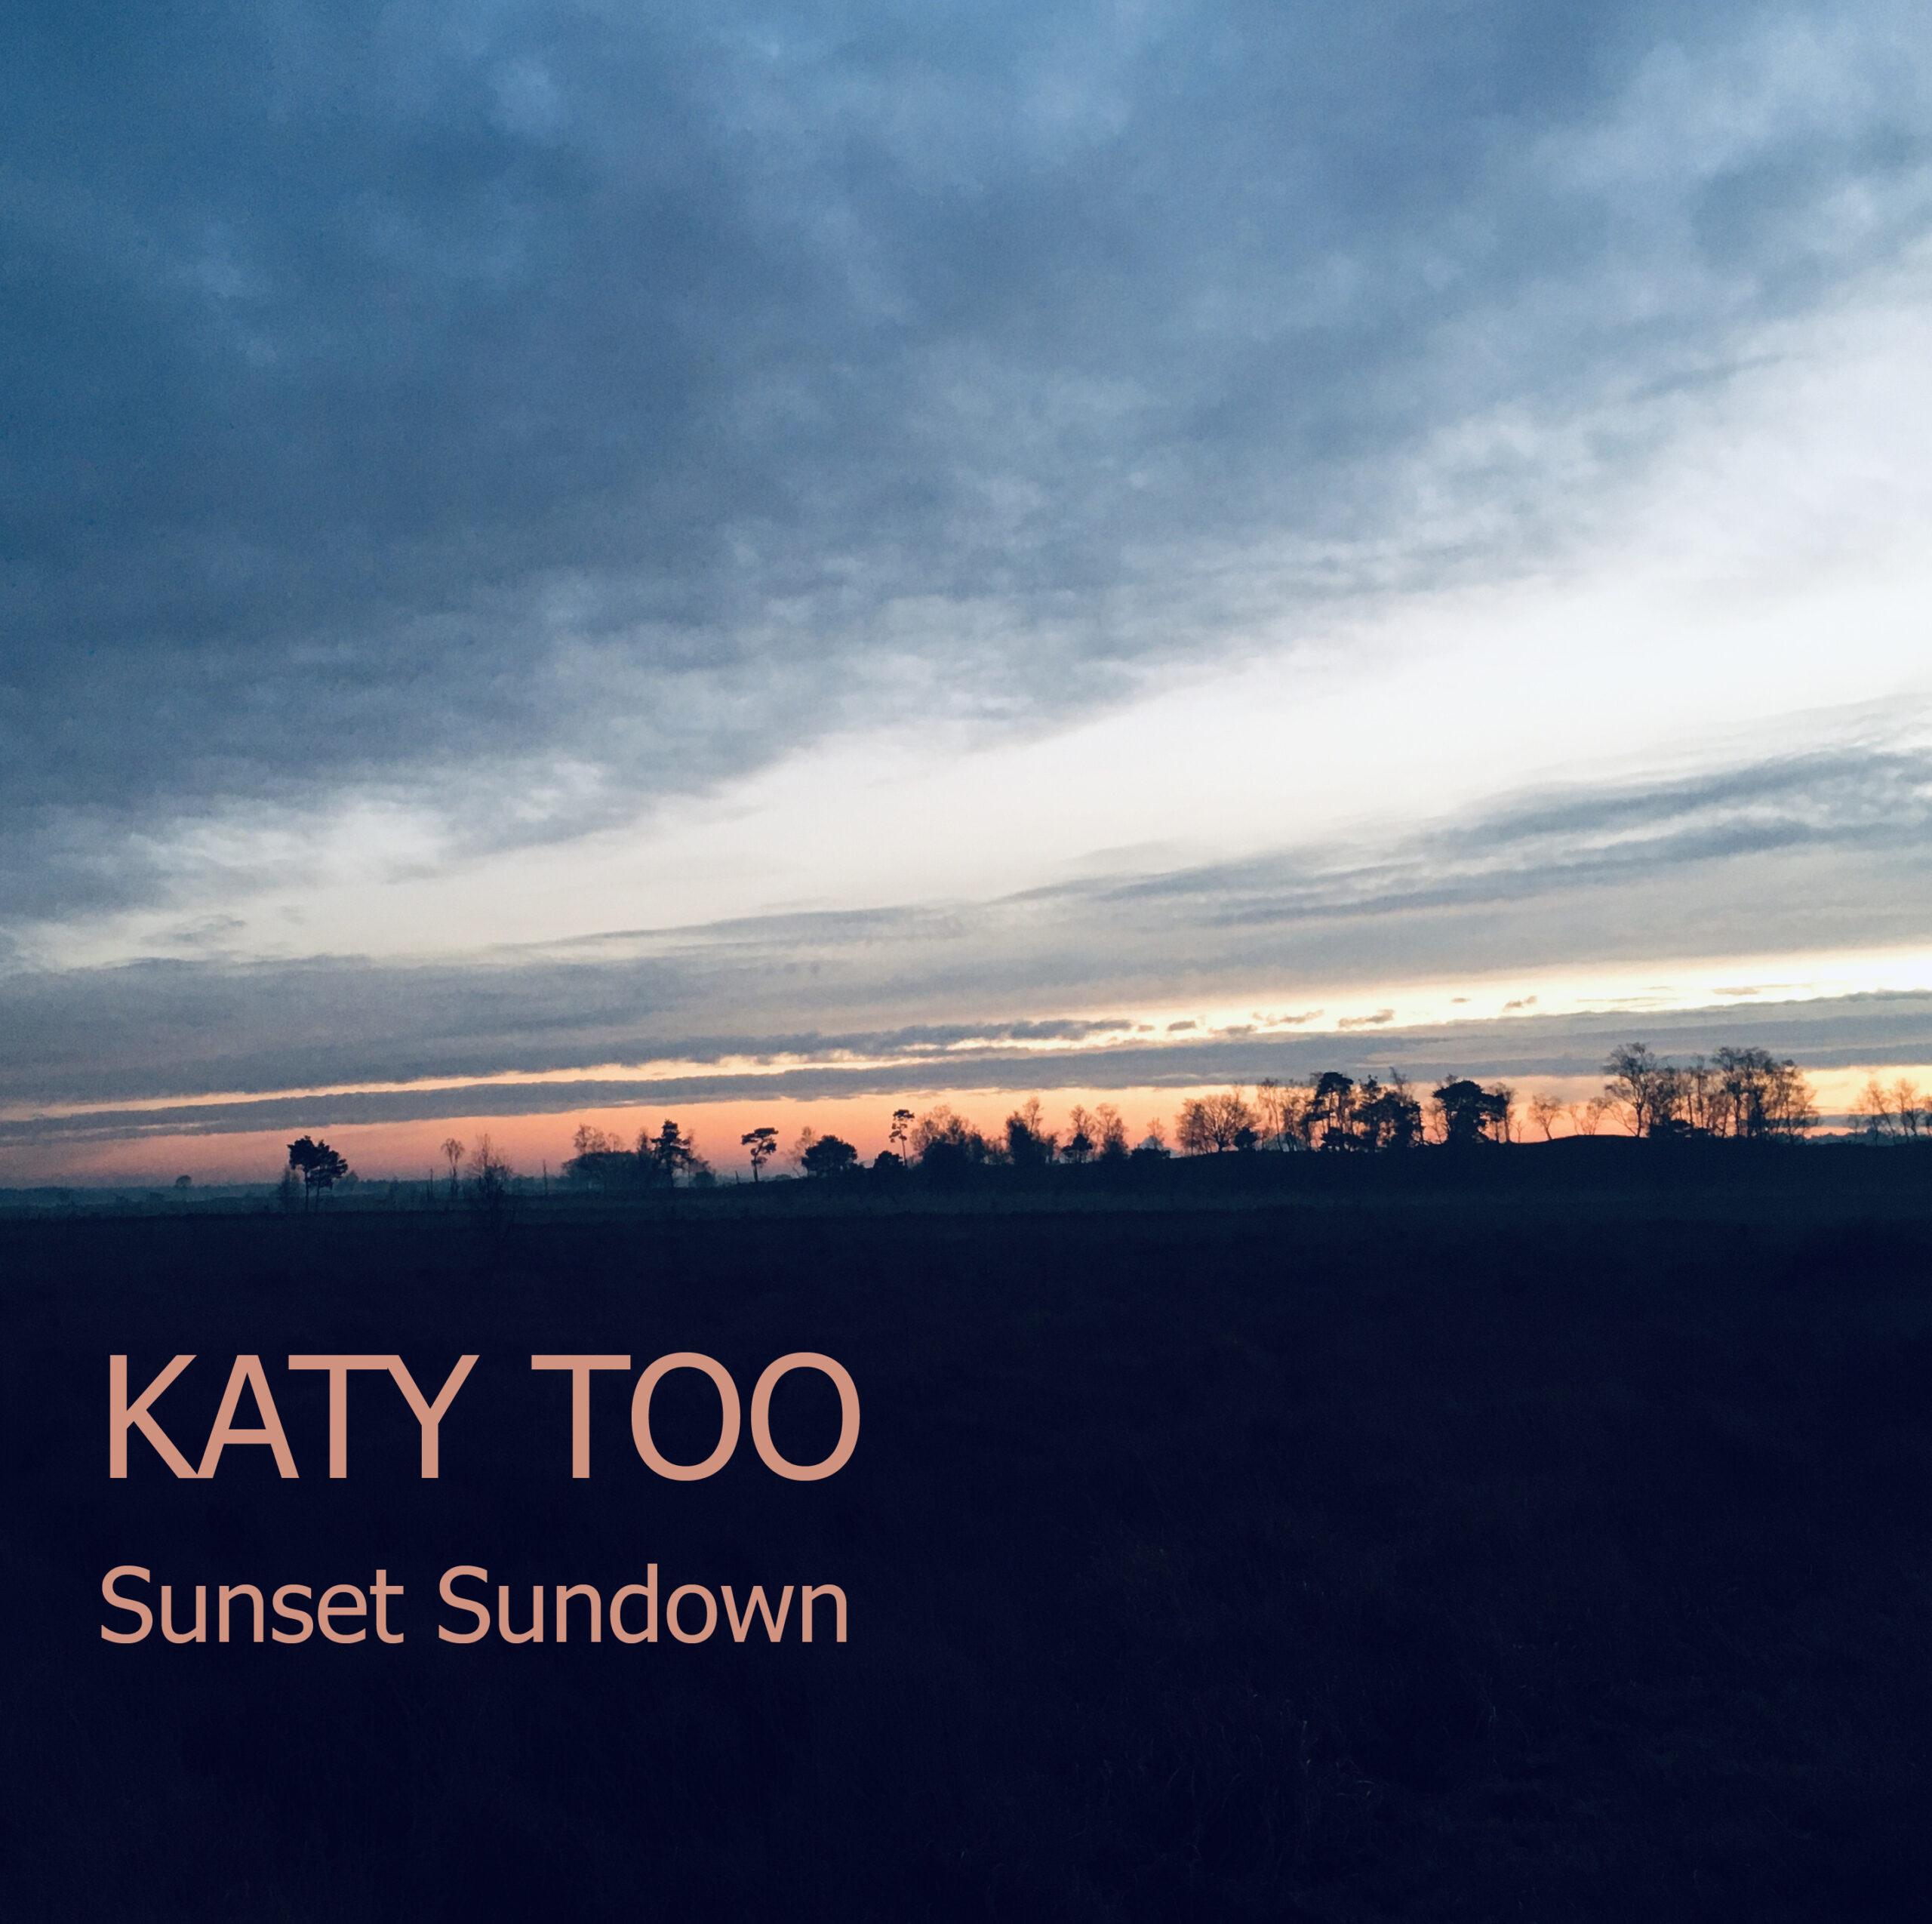 Katy Too is terug van weggeweest